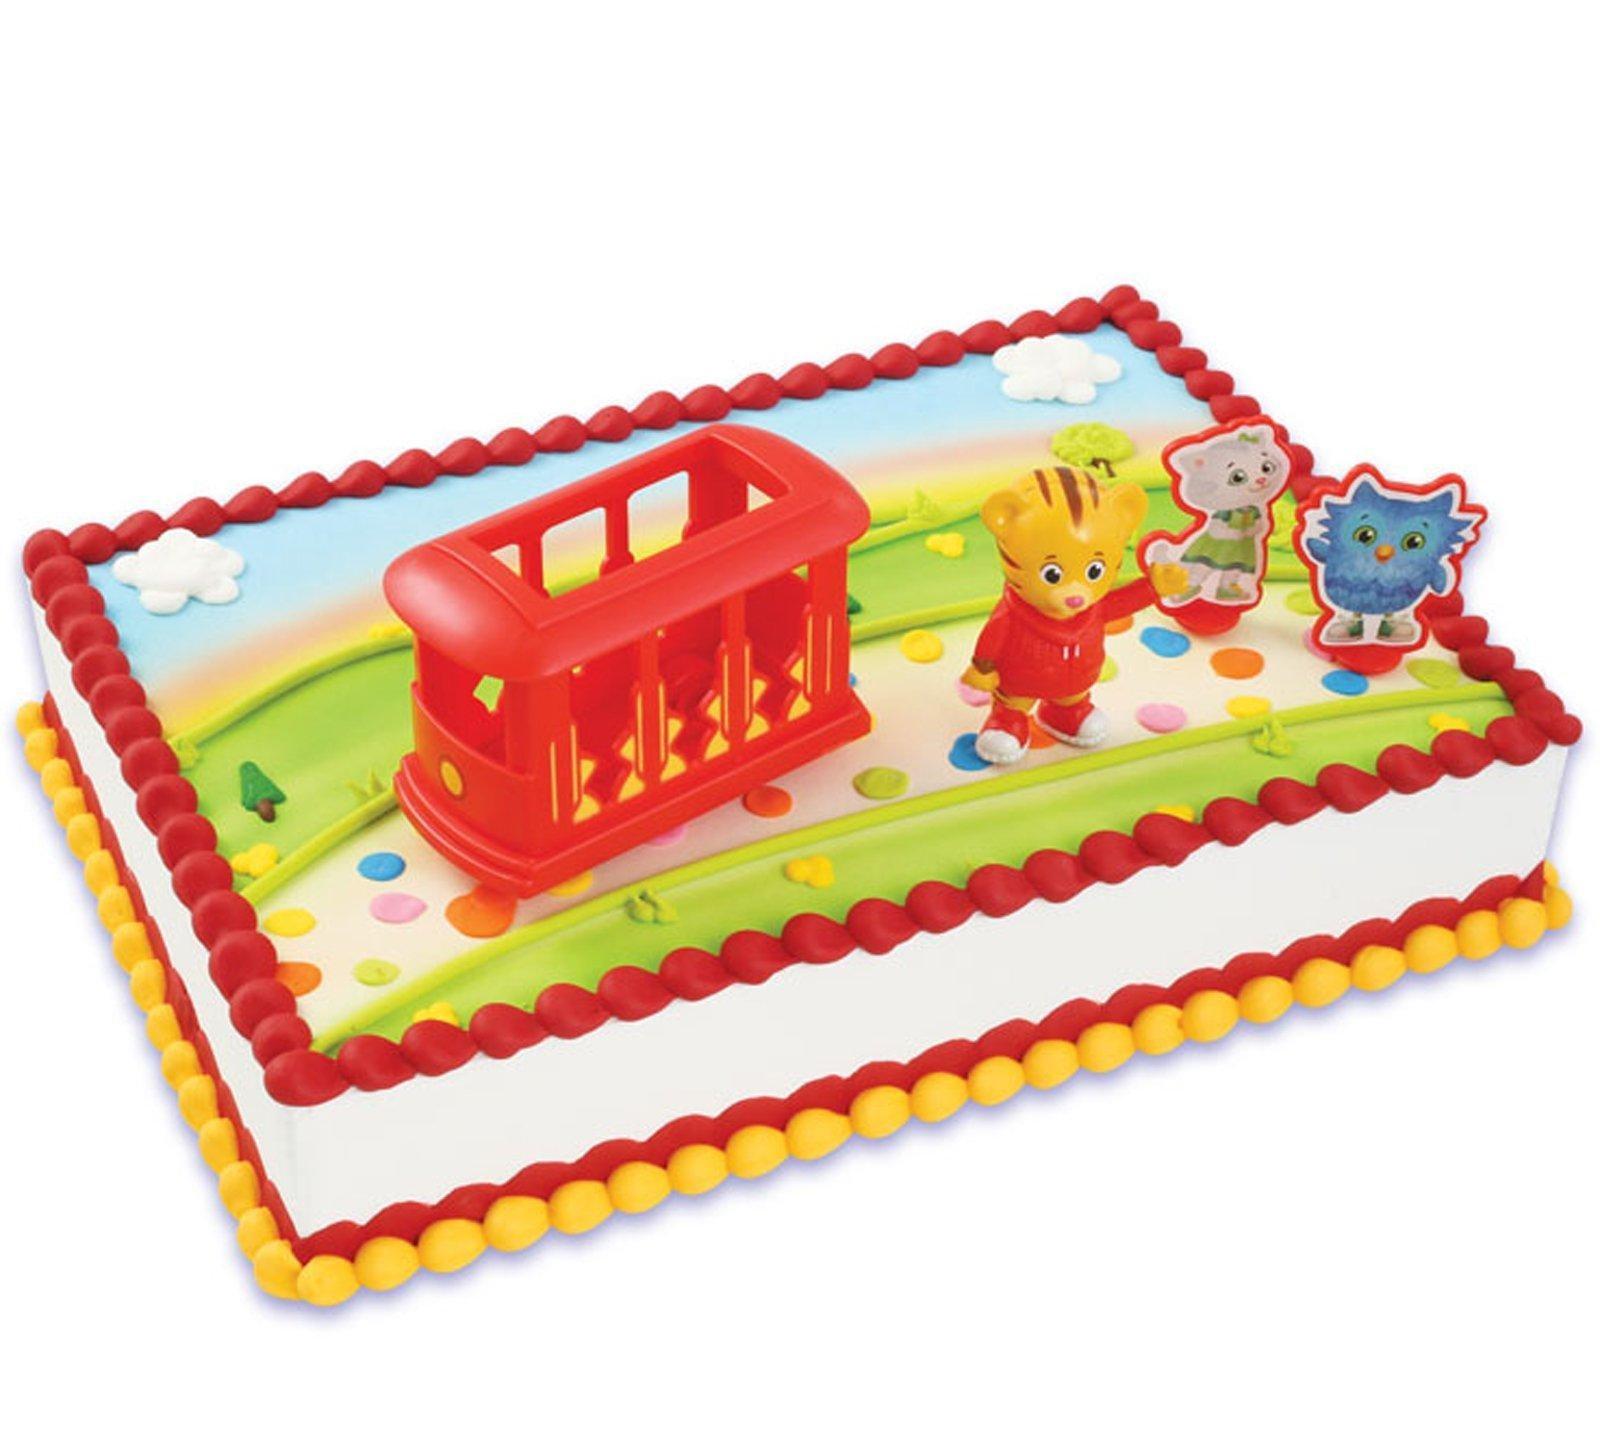 How To Make A Daniel Tiger Birthday Cake